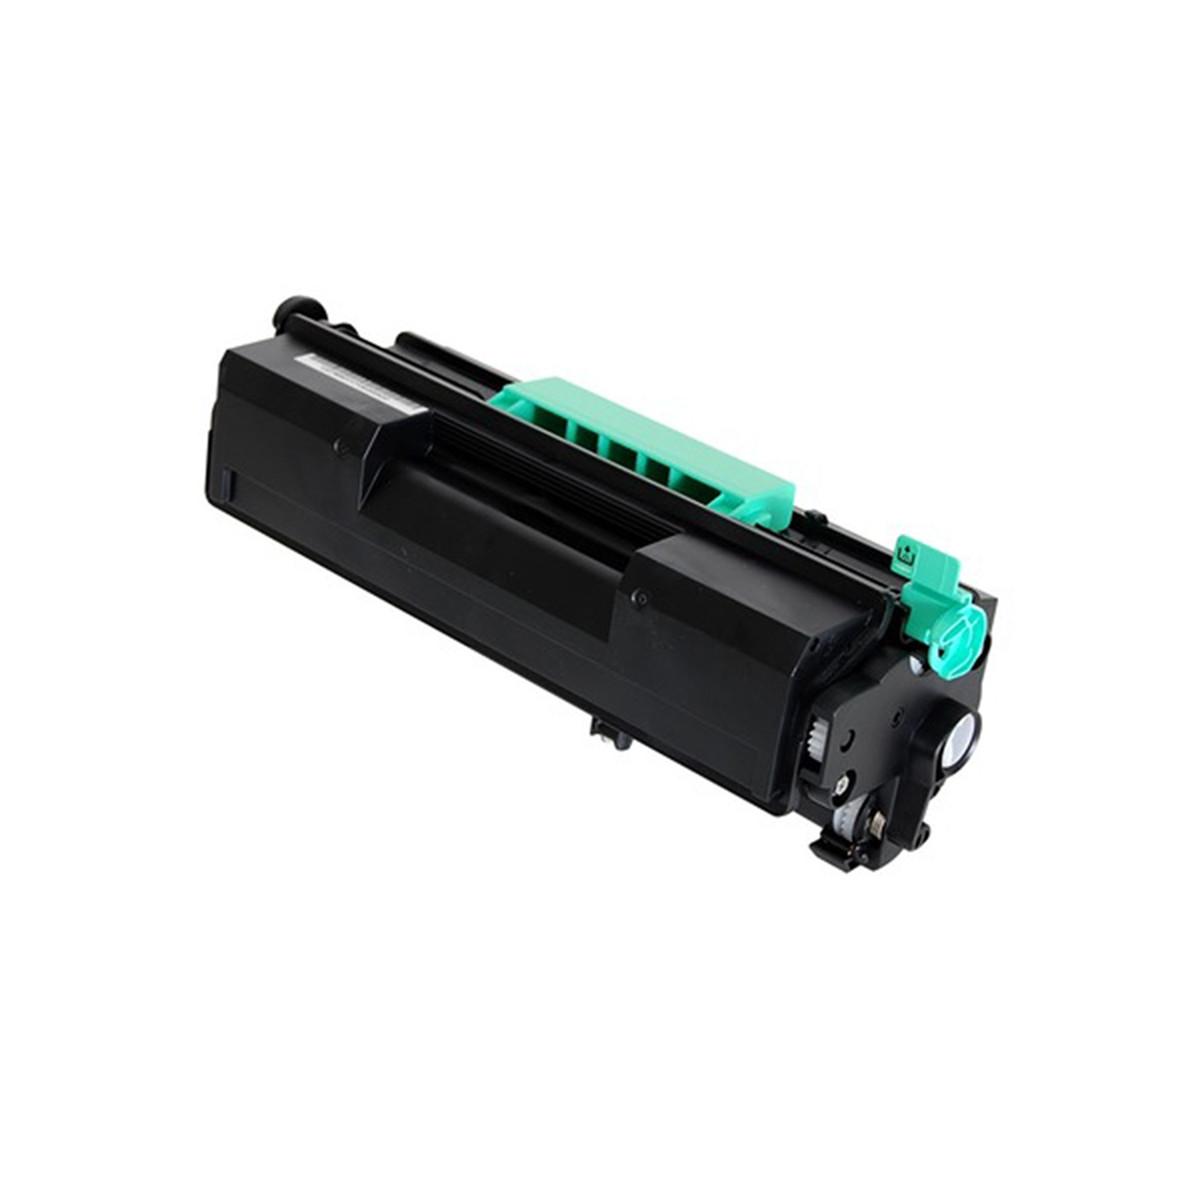 Toner Ricoh SP4500 SP4510 SP4510SF 4510SF 4510 SP4500HA 407316   Katun Select 12k